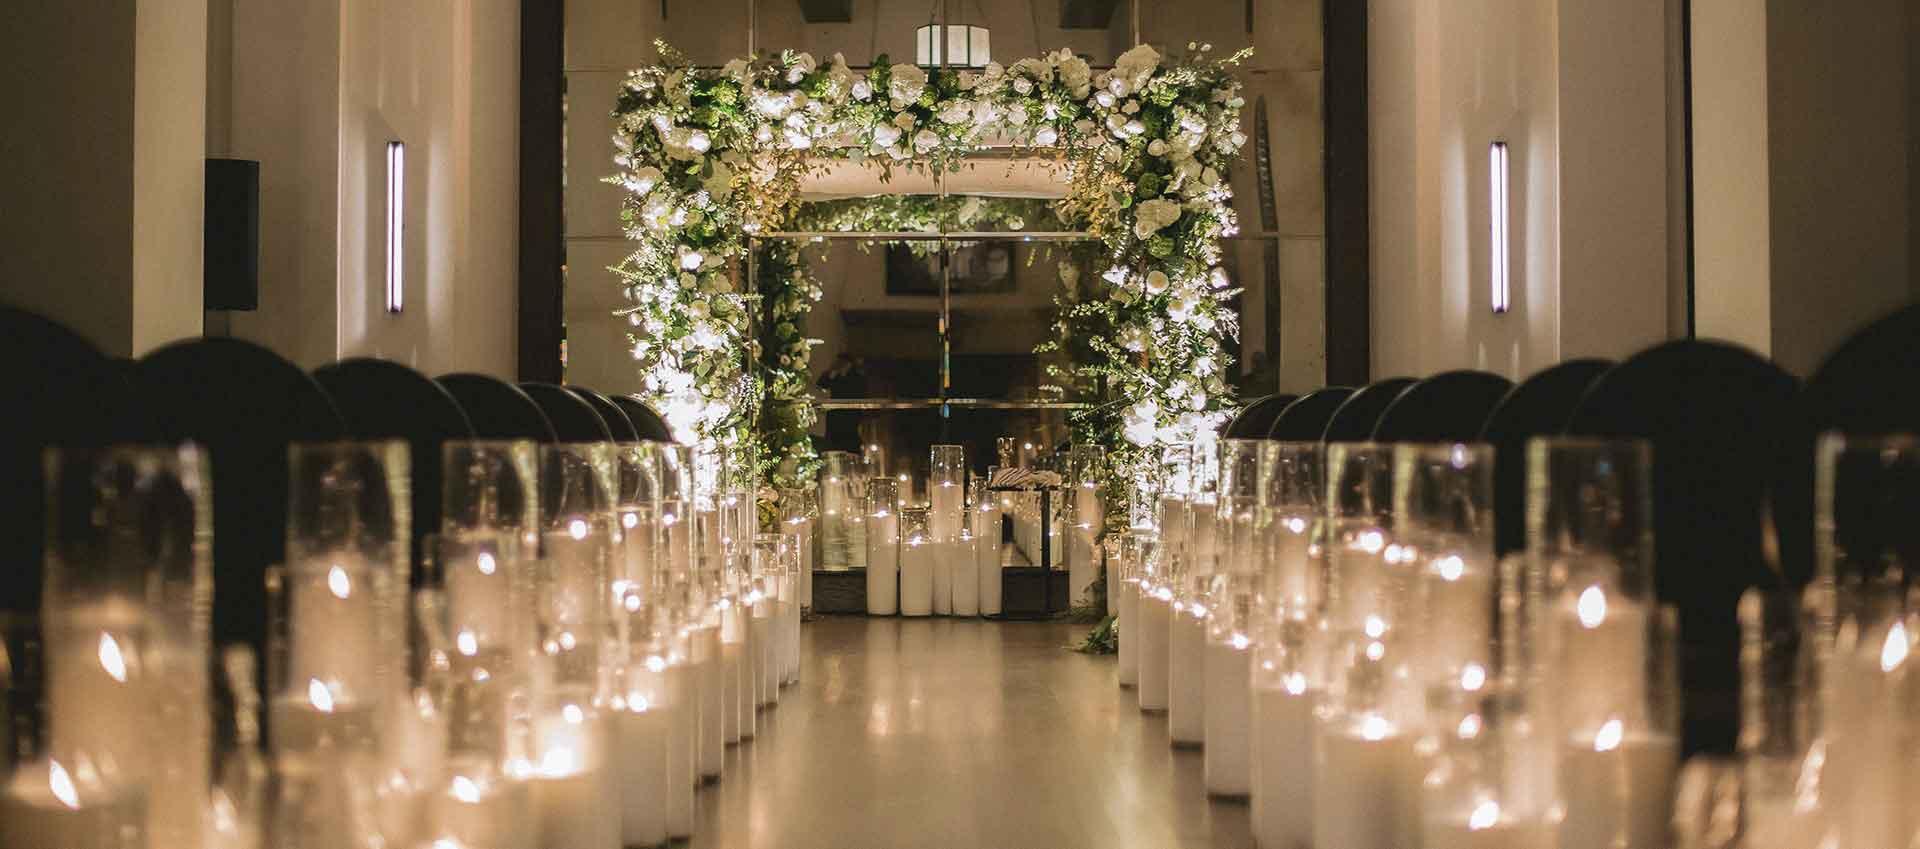 wedding florist los angeles, inside weddings